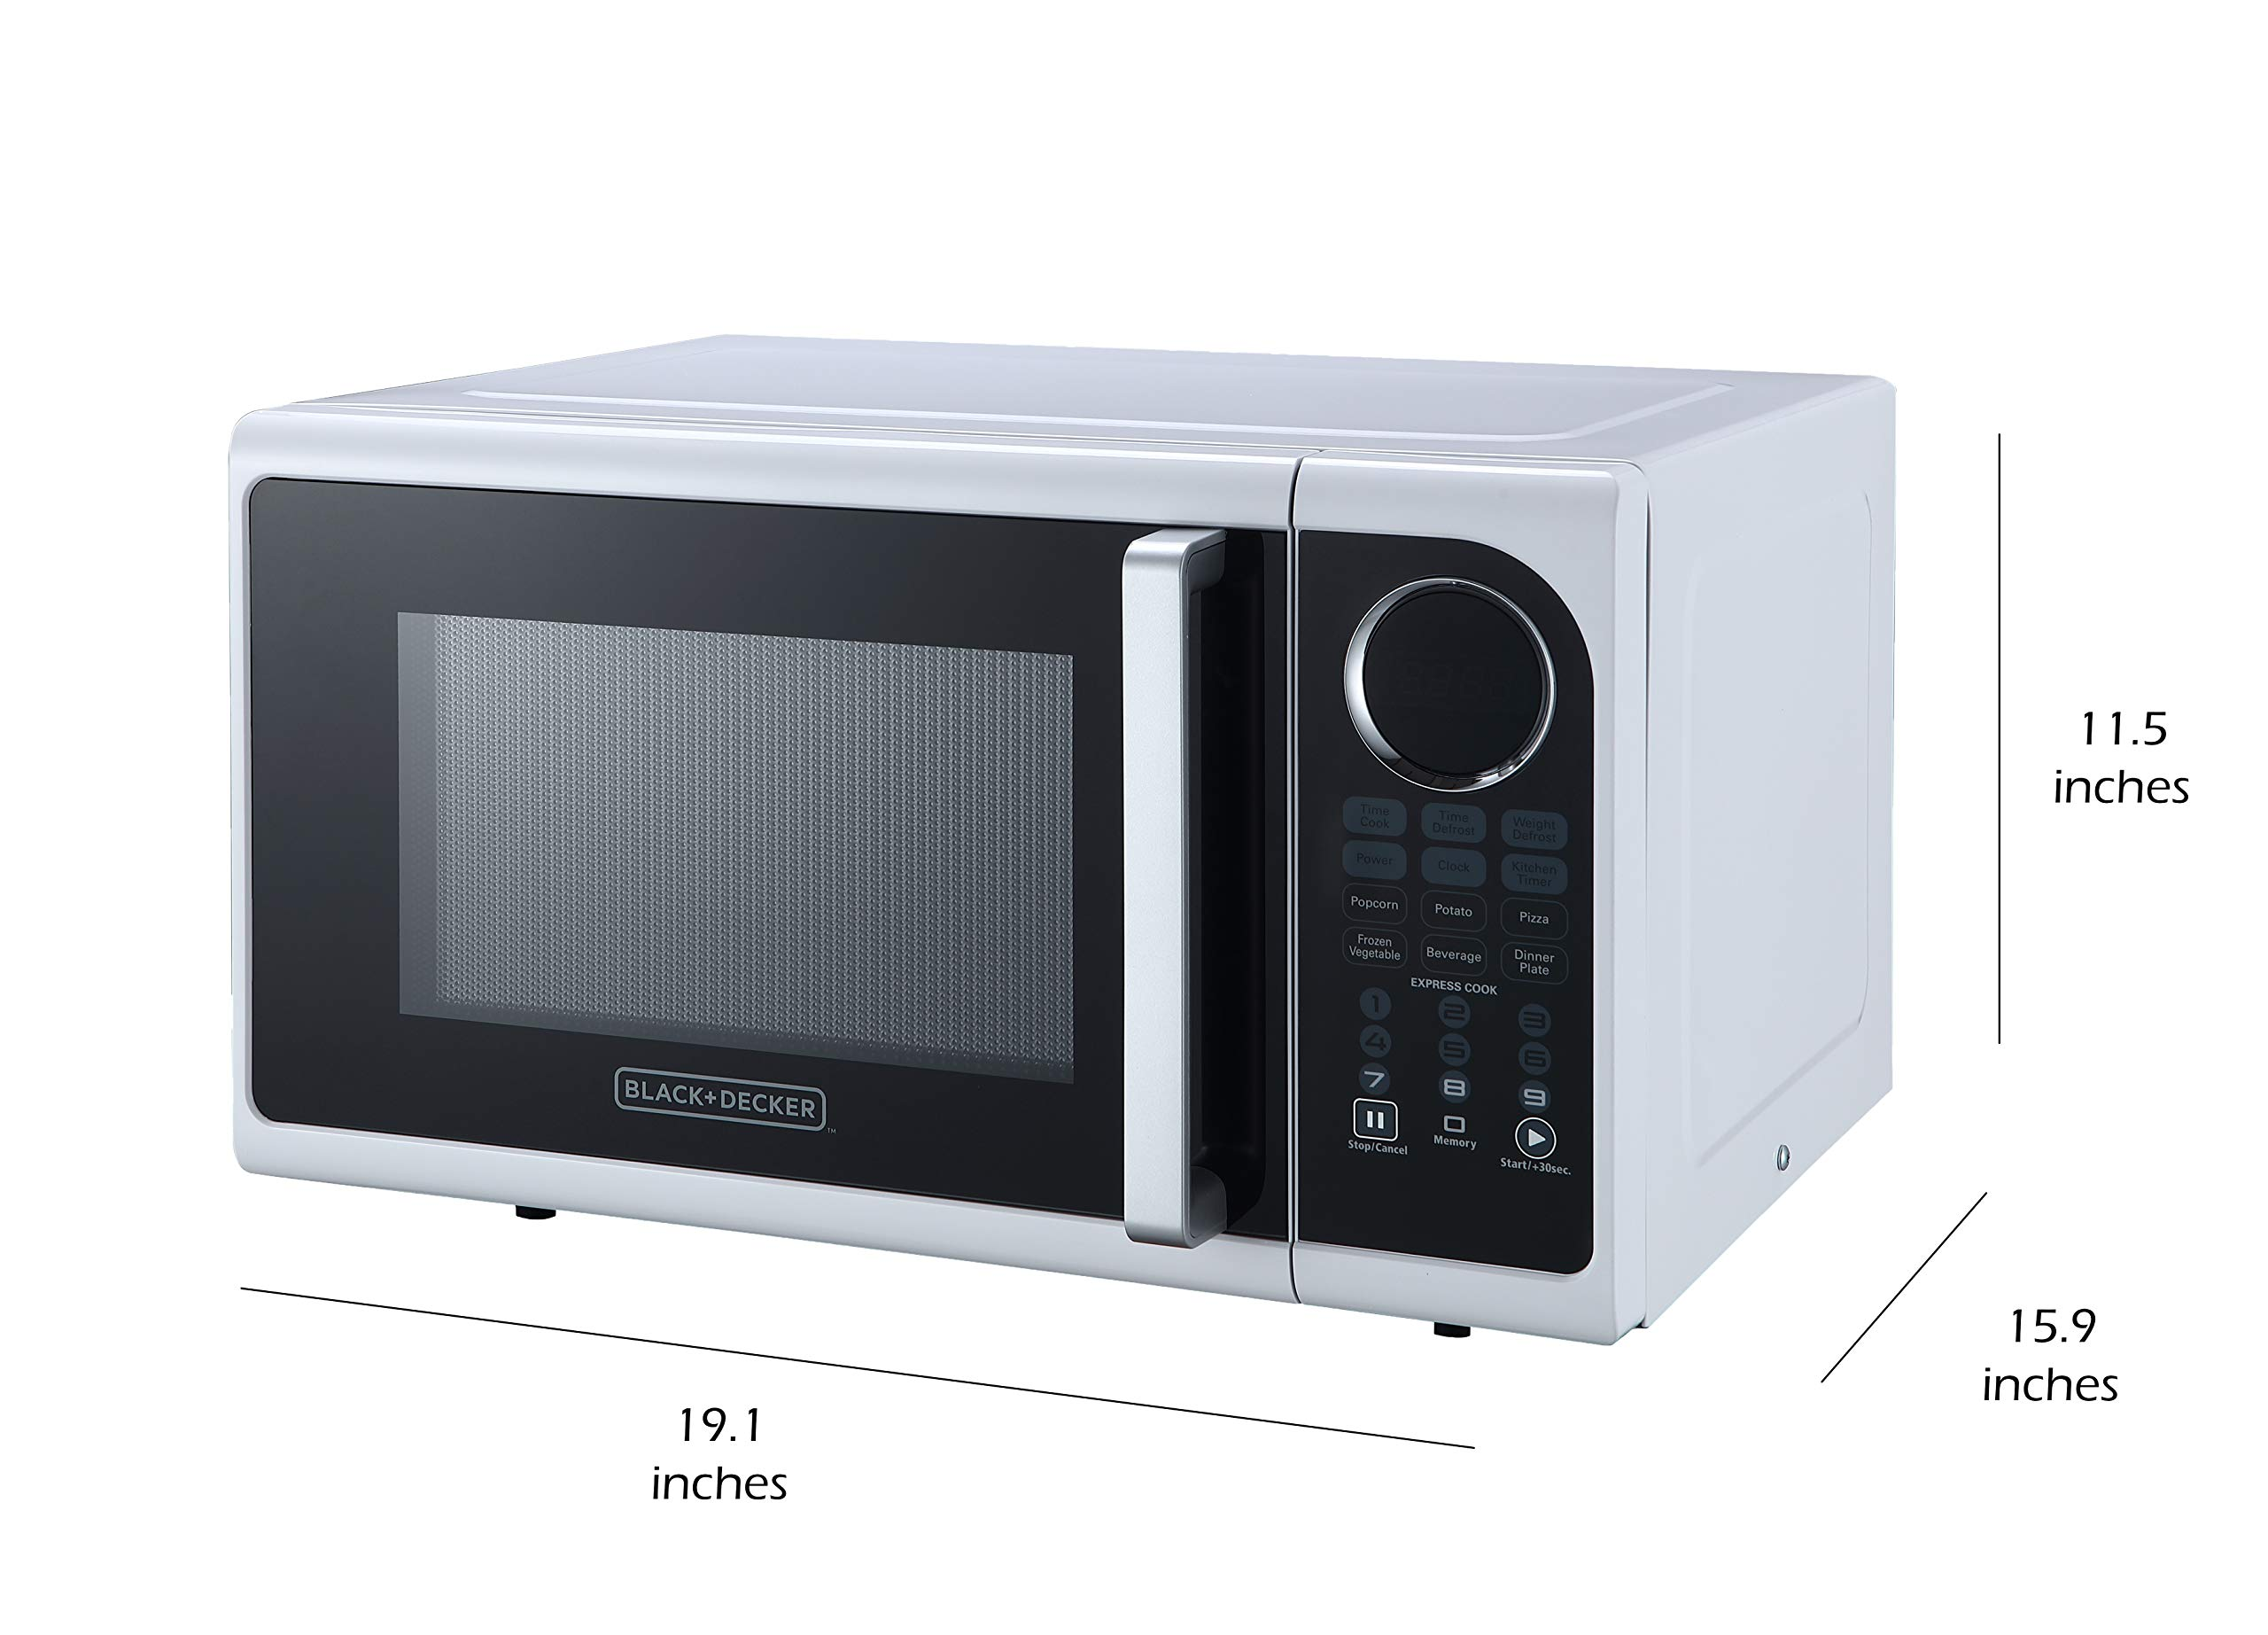 Black+Decker EM925ACP-P1 0.9 Cu. Ft. Digital Microwave, White by BLACK+DECKER (Image #6)